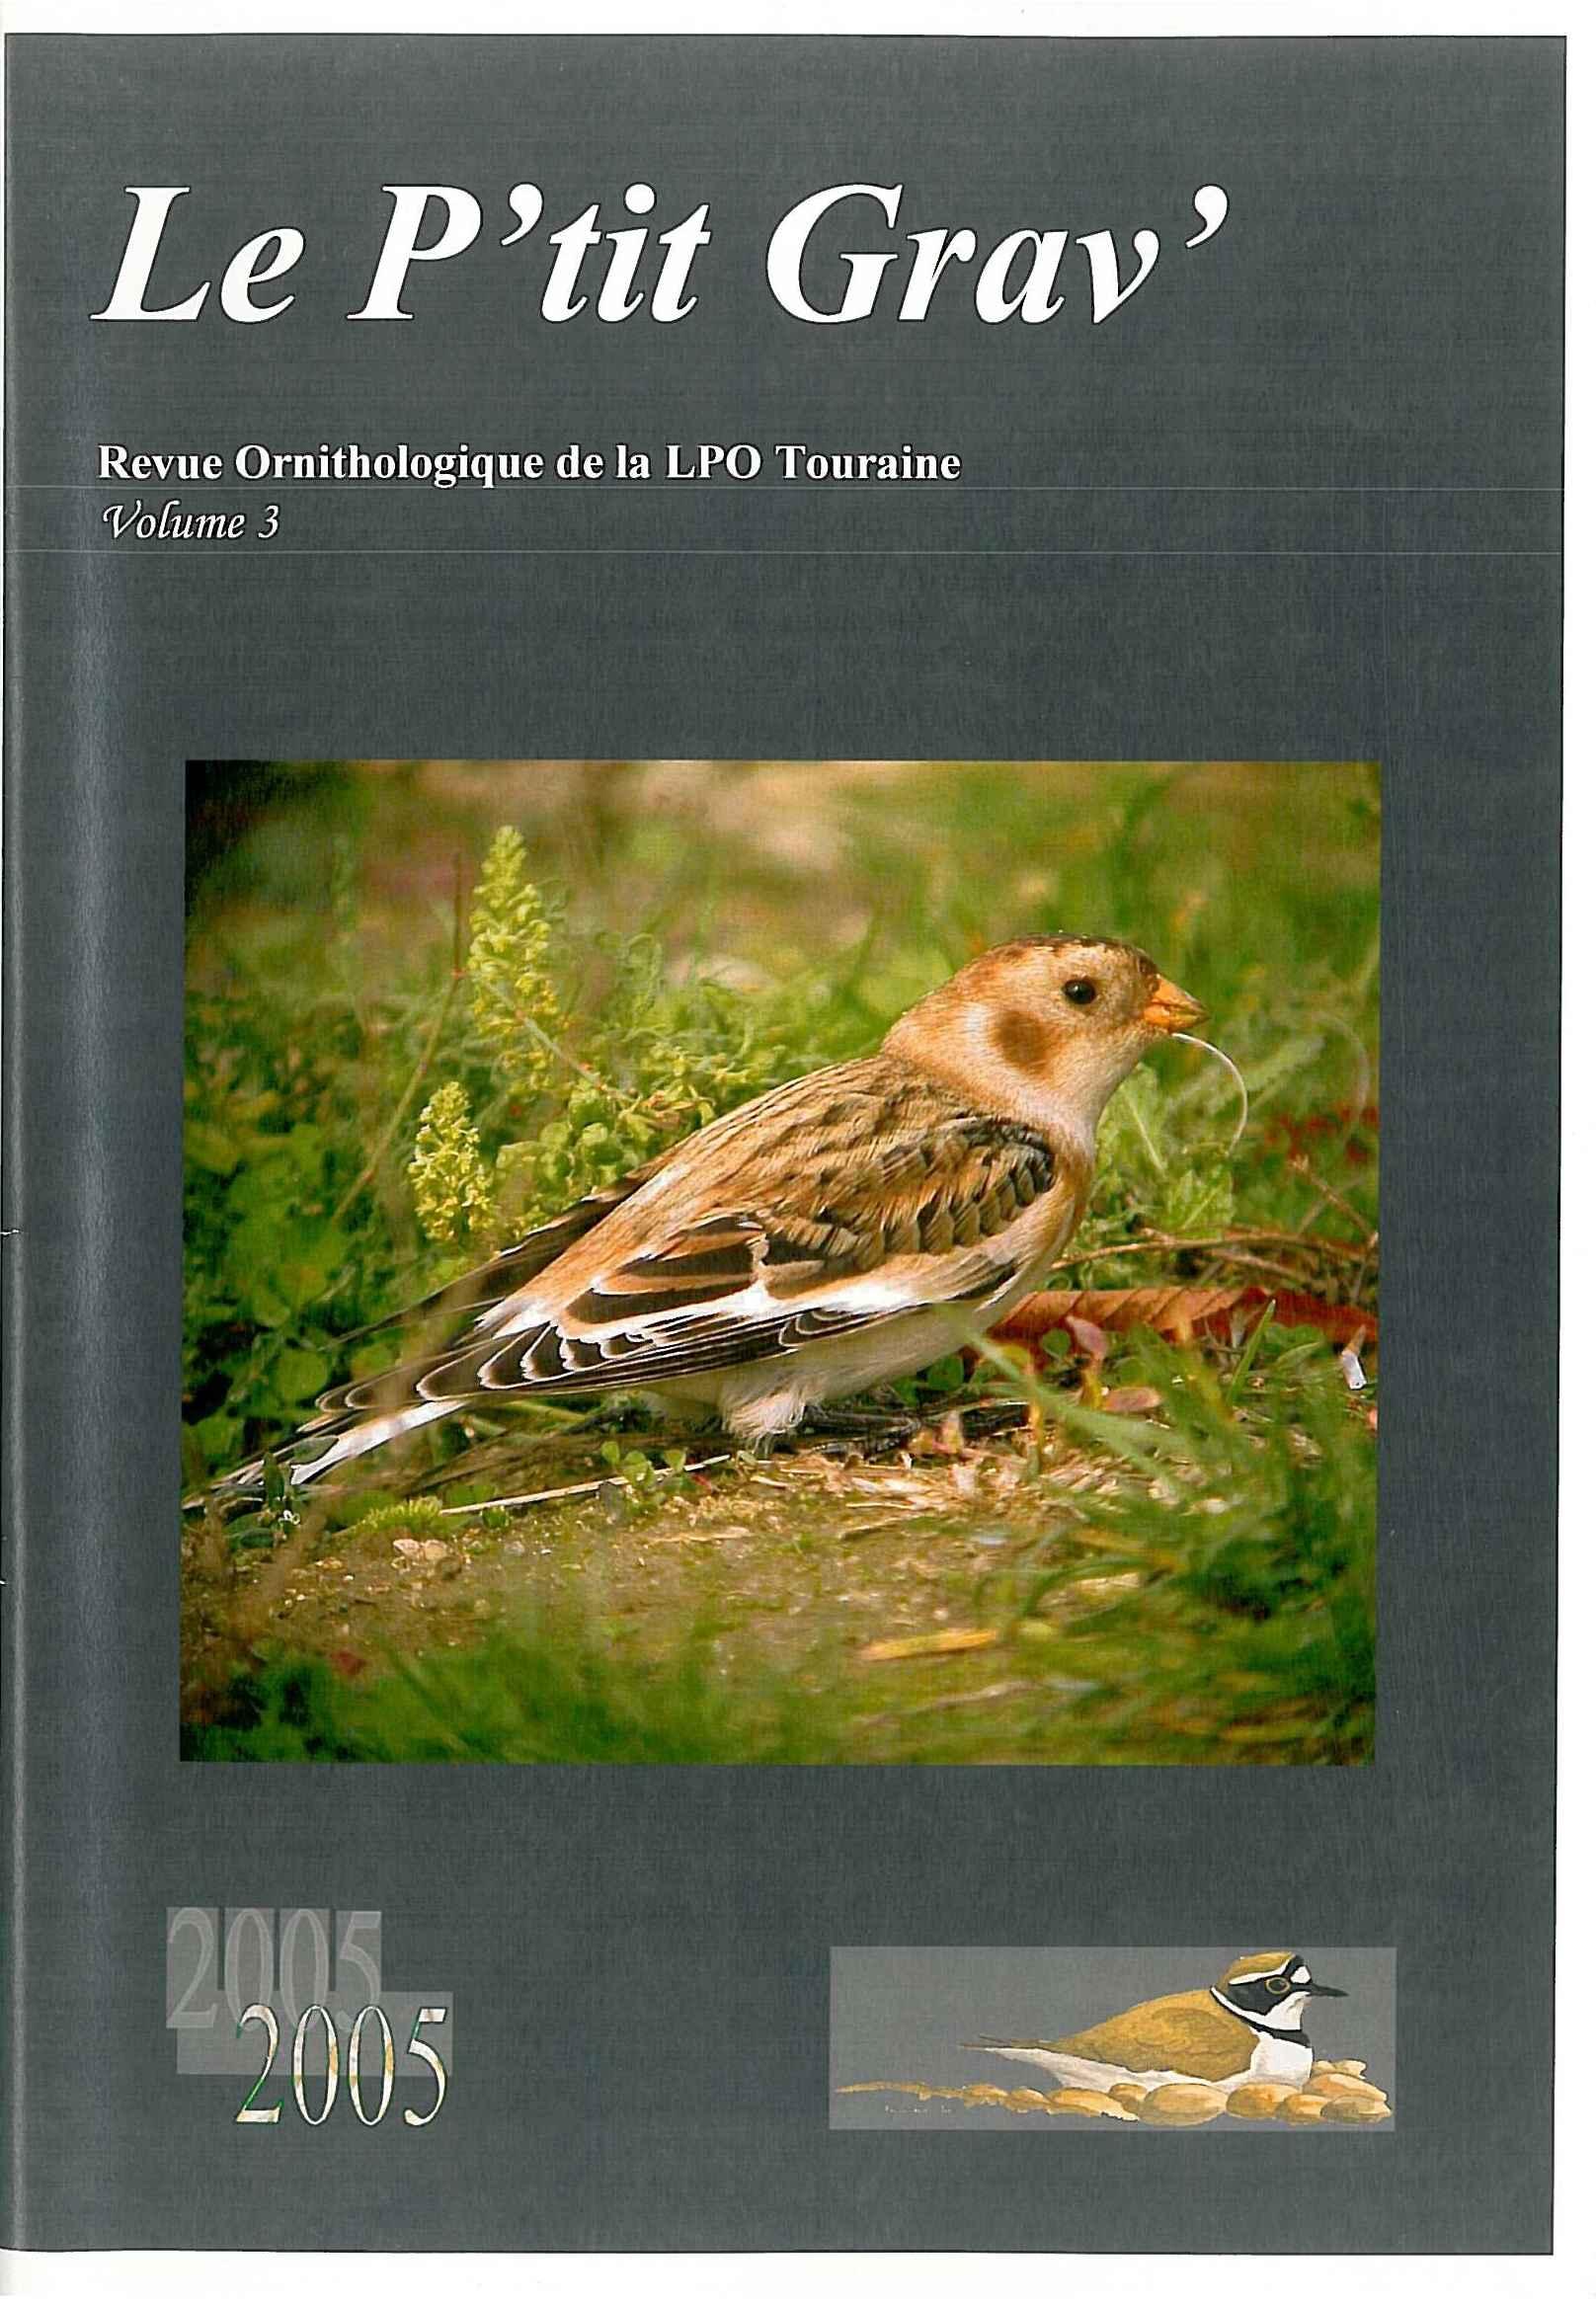 https://cdnfiles1.biolovision.net/www.faune-touraine.org/userfiles/MonDossier/PtitGravvol3.jpg